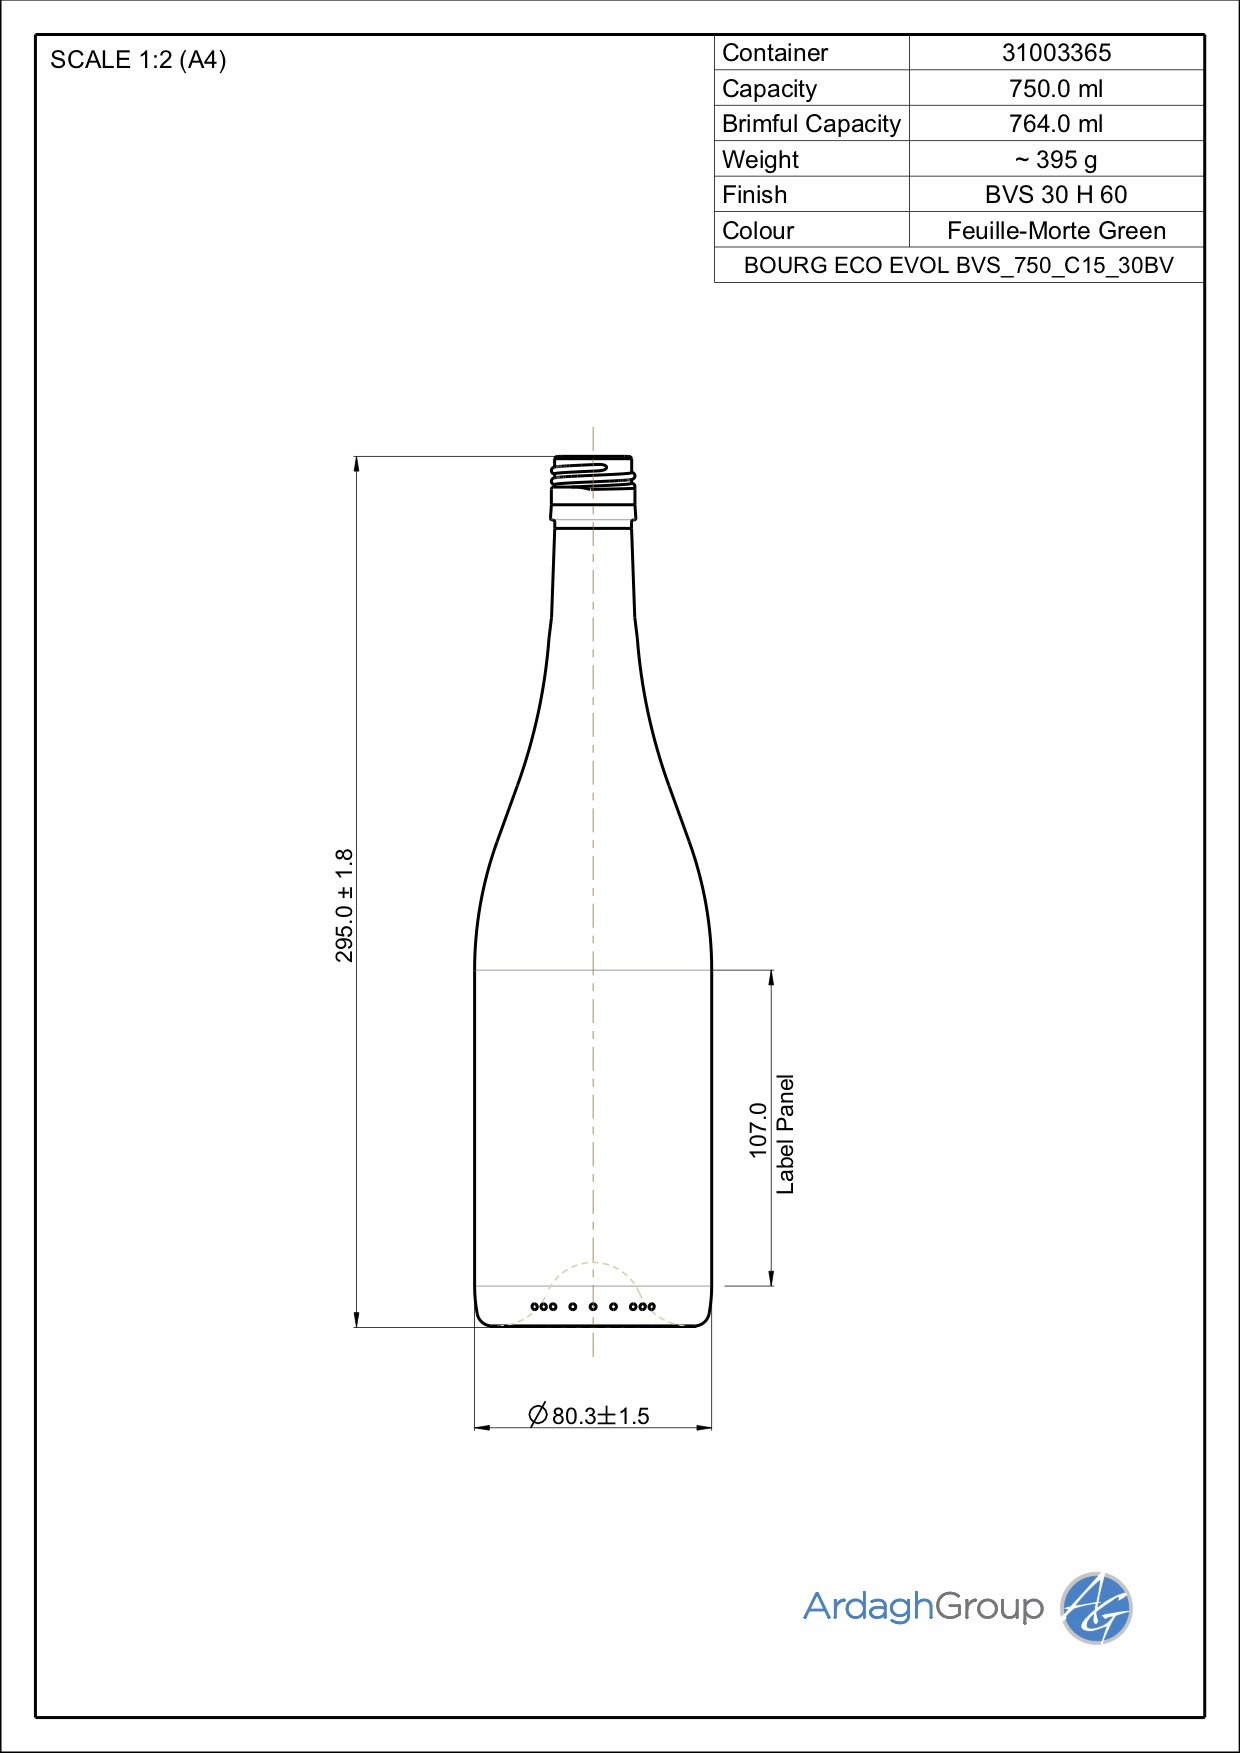 750ml green glass Bourg Eco oneway wine bottle